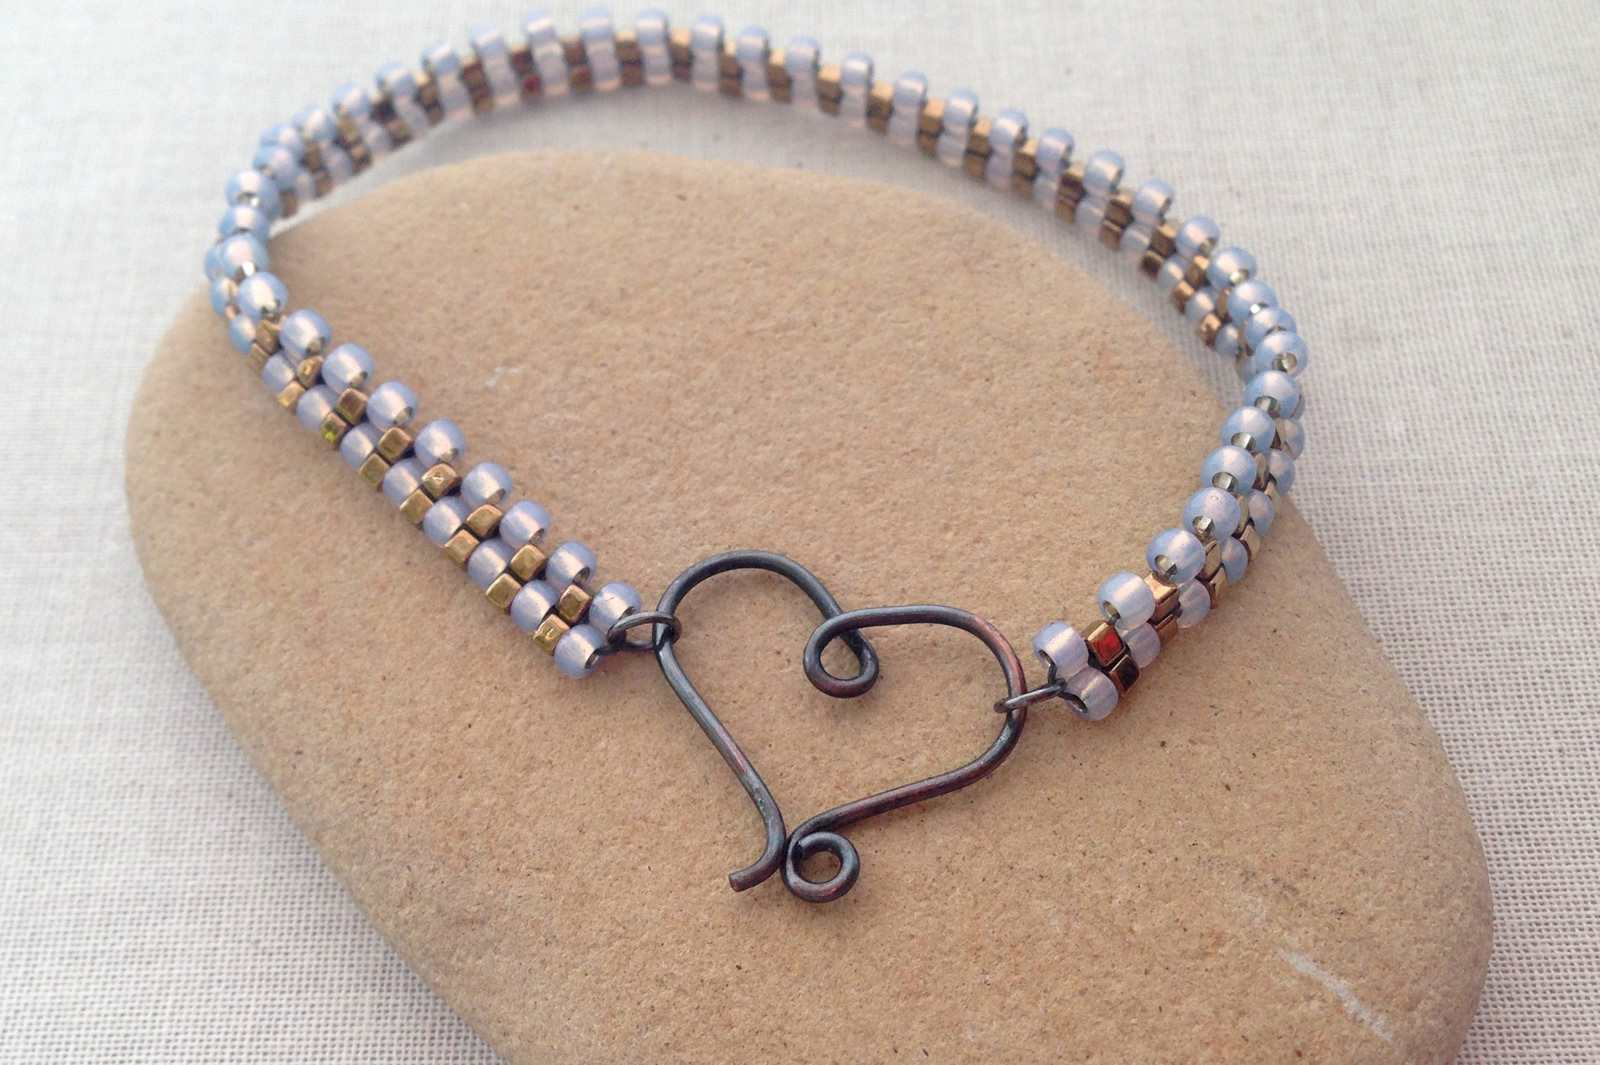 Brick stitch bracelet with handmade heart clasp